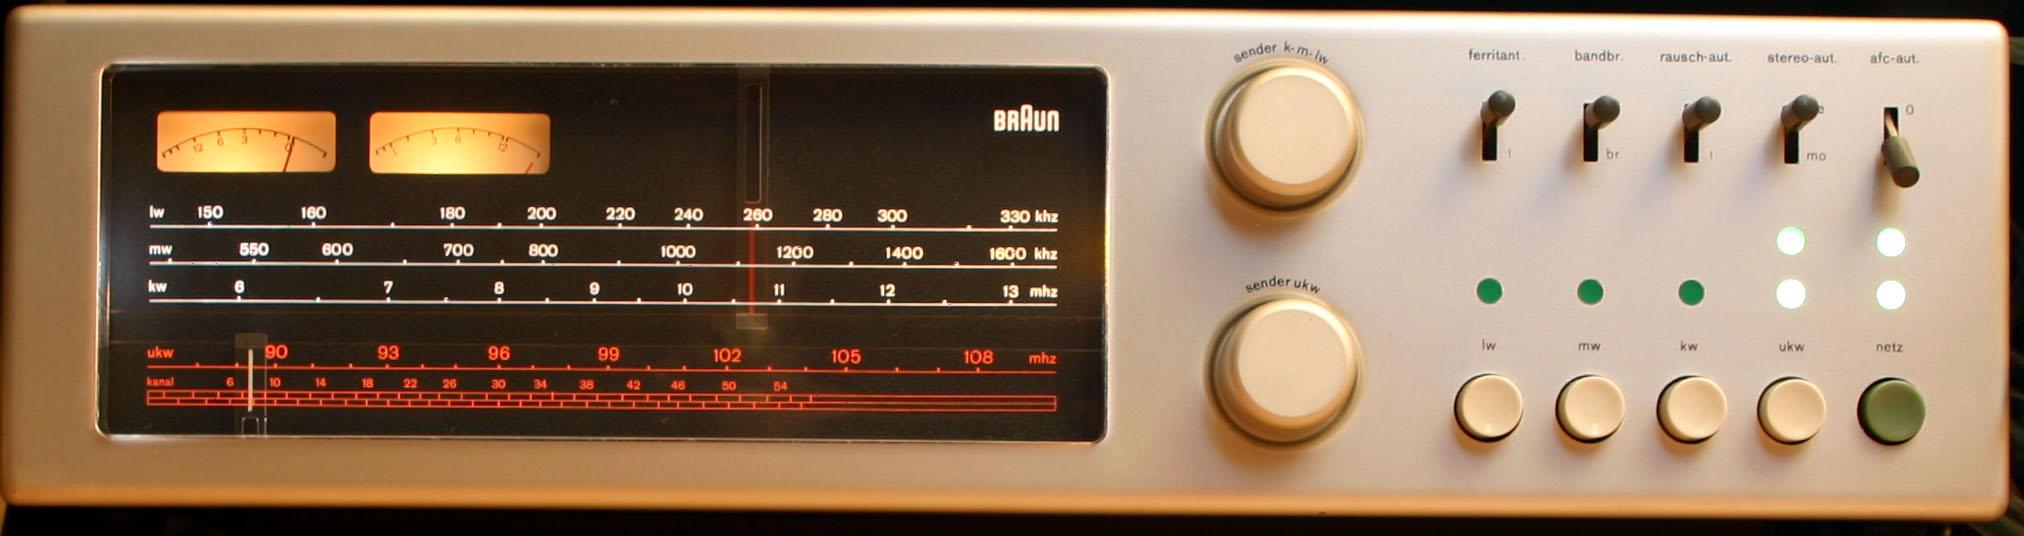 BRAUN TS-1000